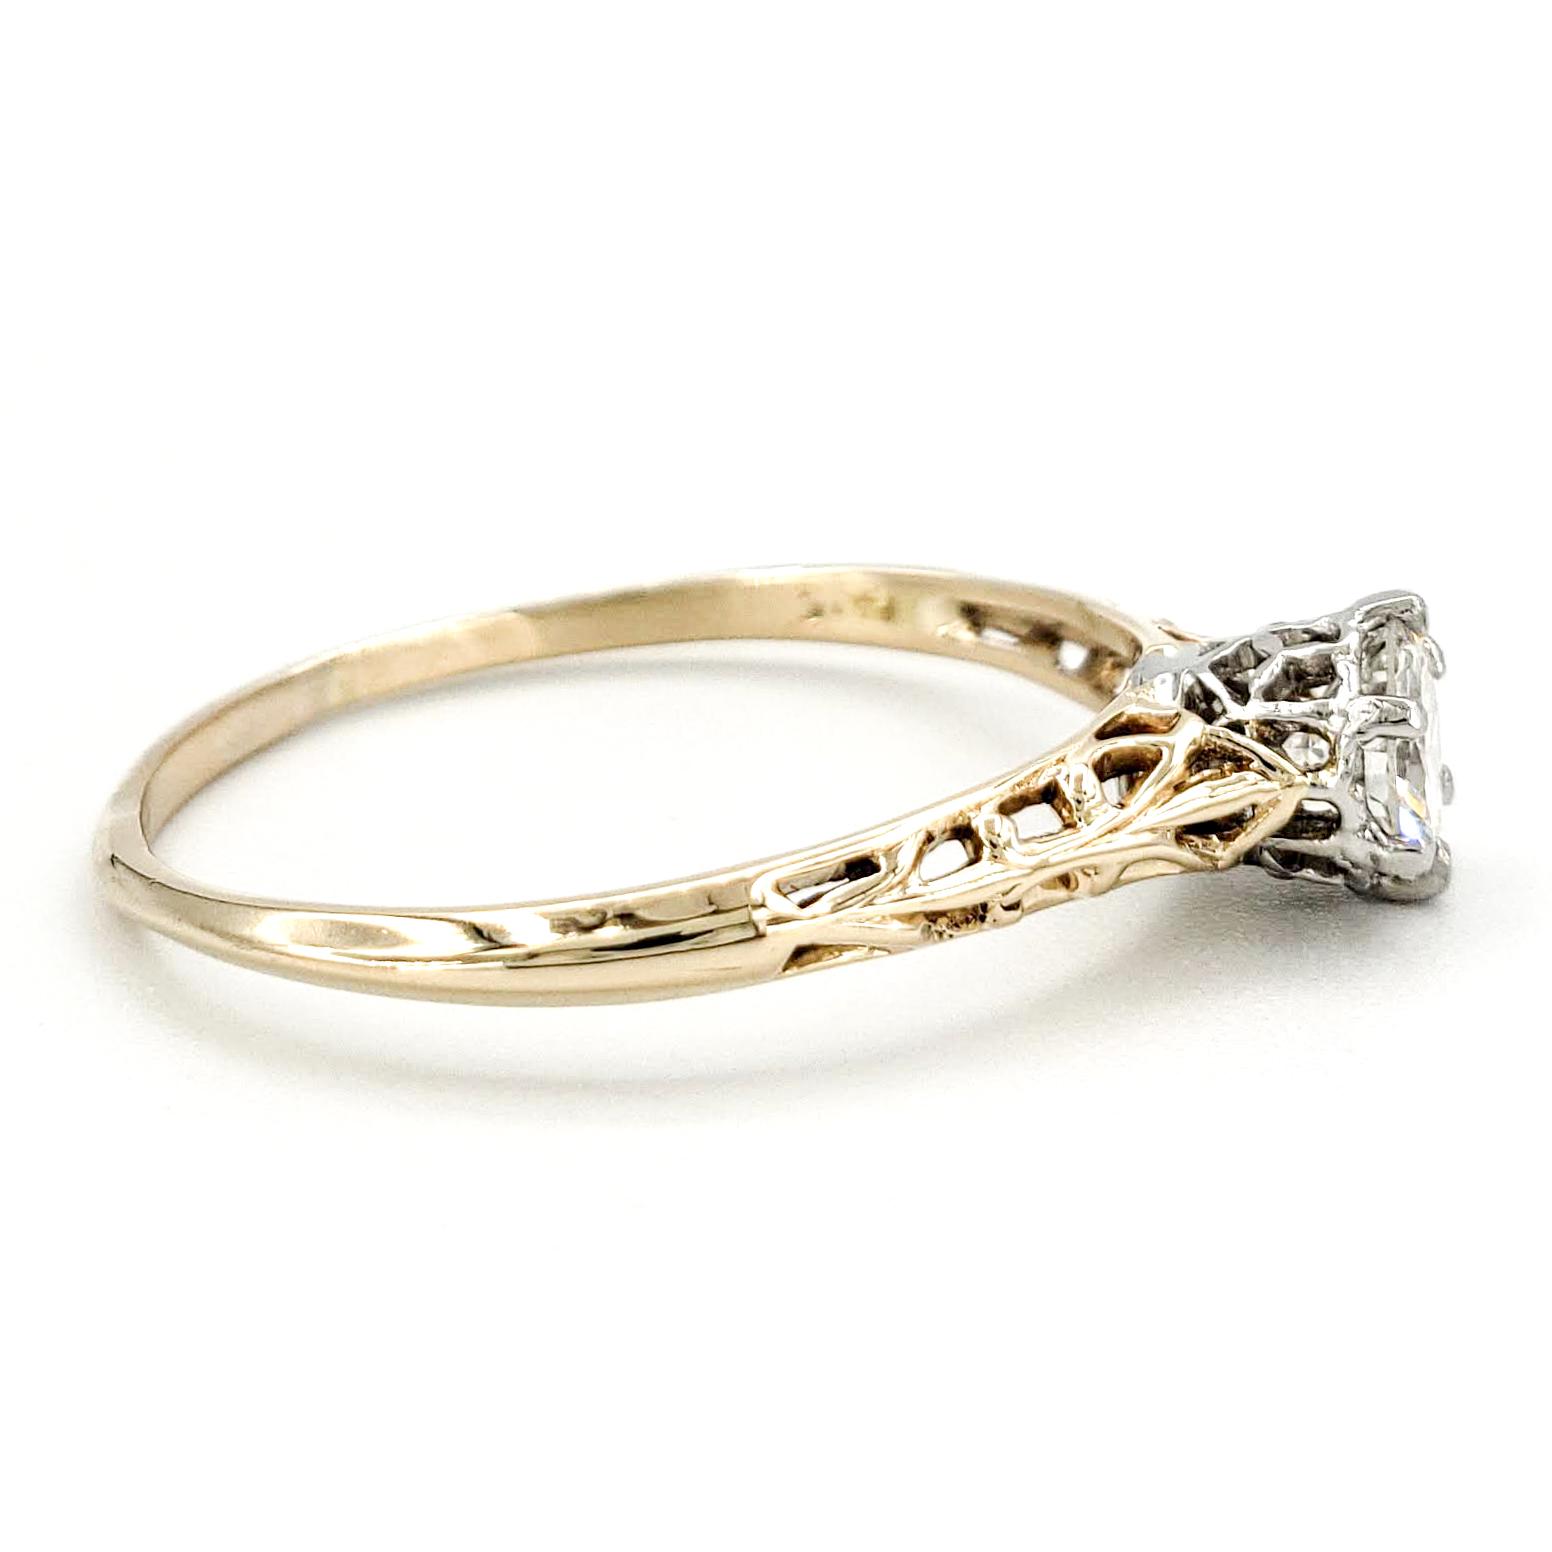 vintage-14-karat-gold-engagement-ring-with-0-39-carat-old-european-cut-diamond-egl-g-vs2